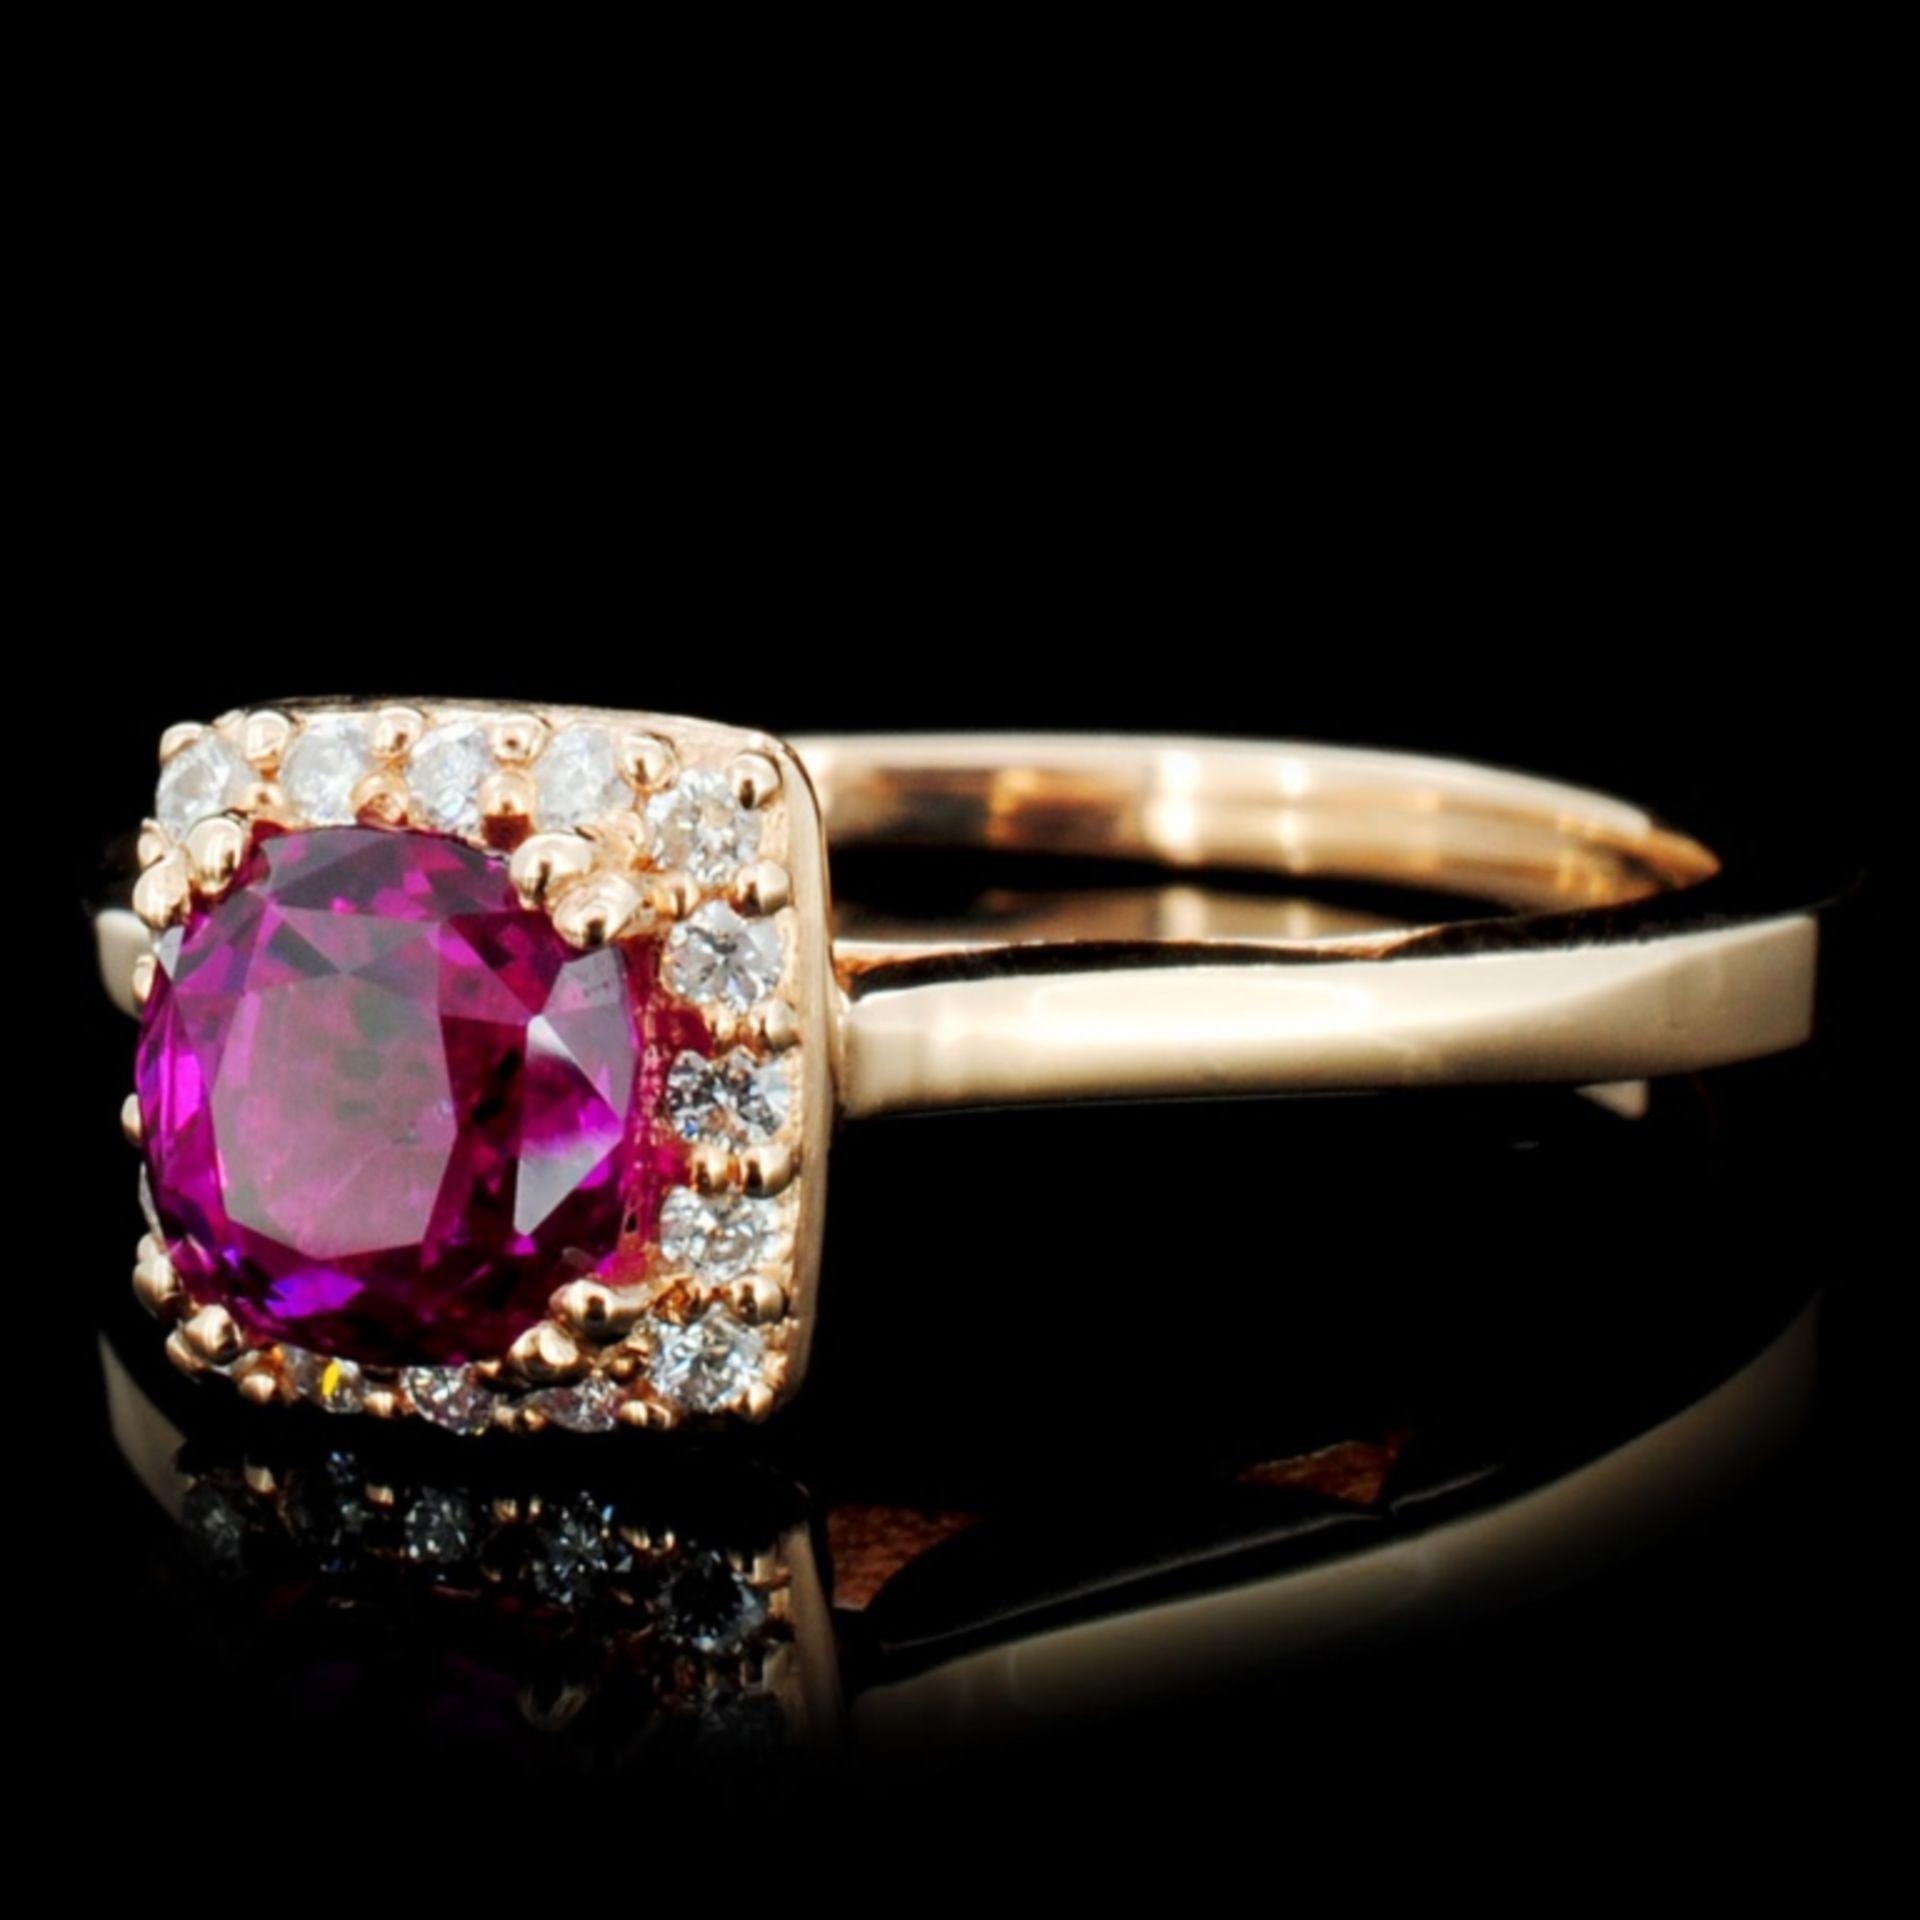 18K Gold 1.00ct Ruby & 0.35ctw Diamond Ring - Image 2 of 3